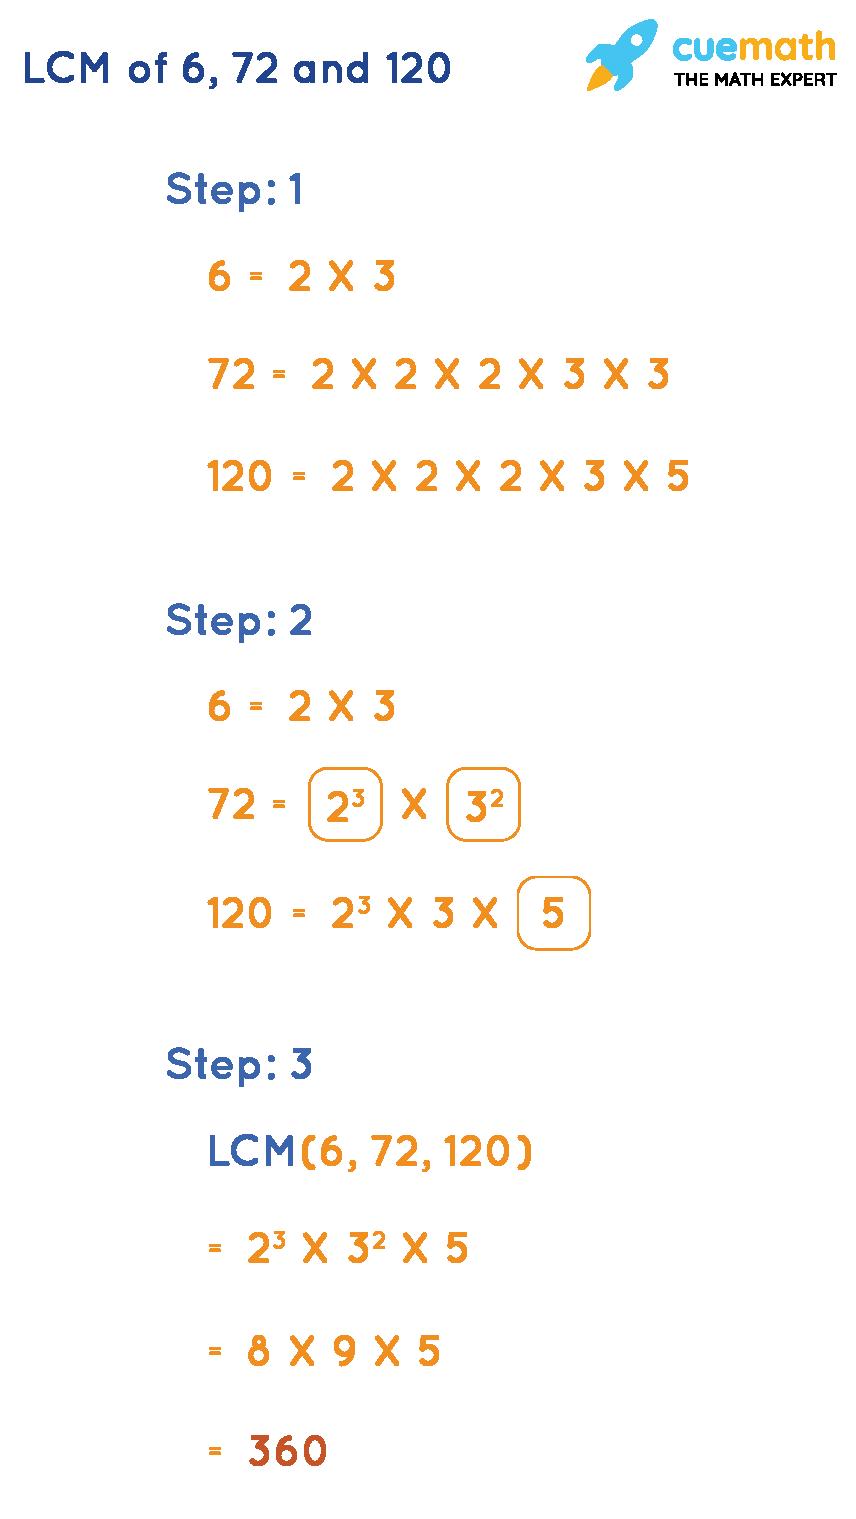 LCM-6-7-120